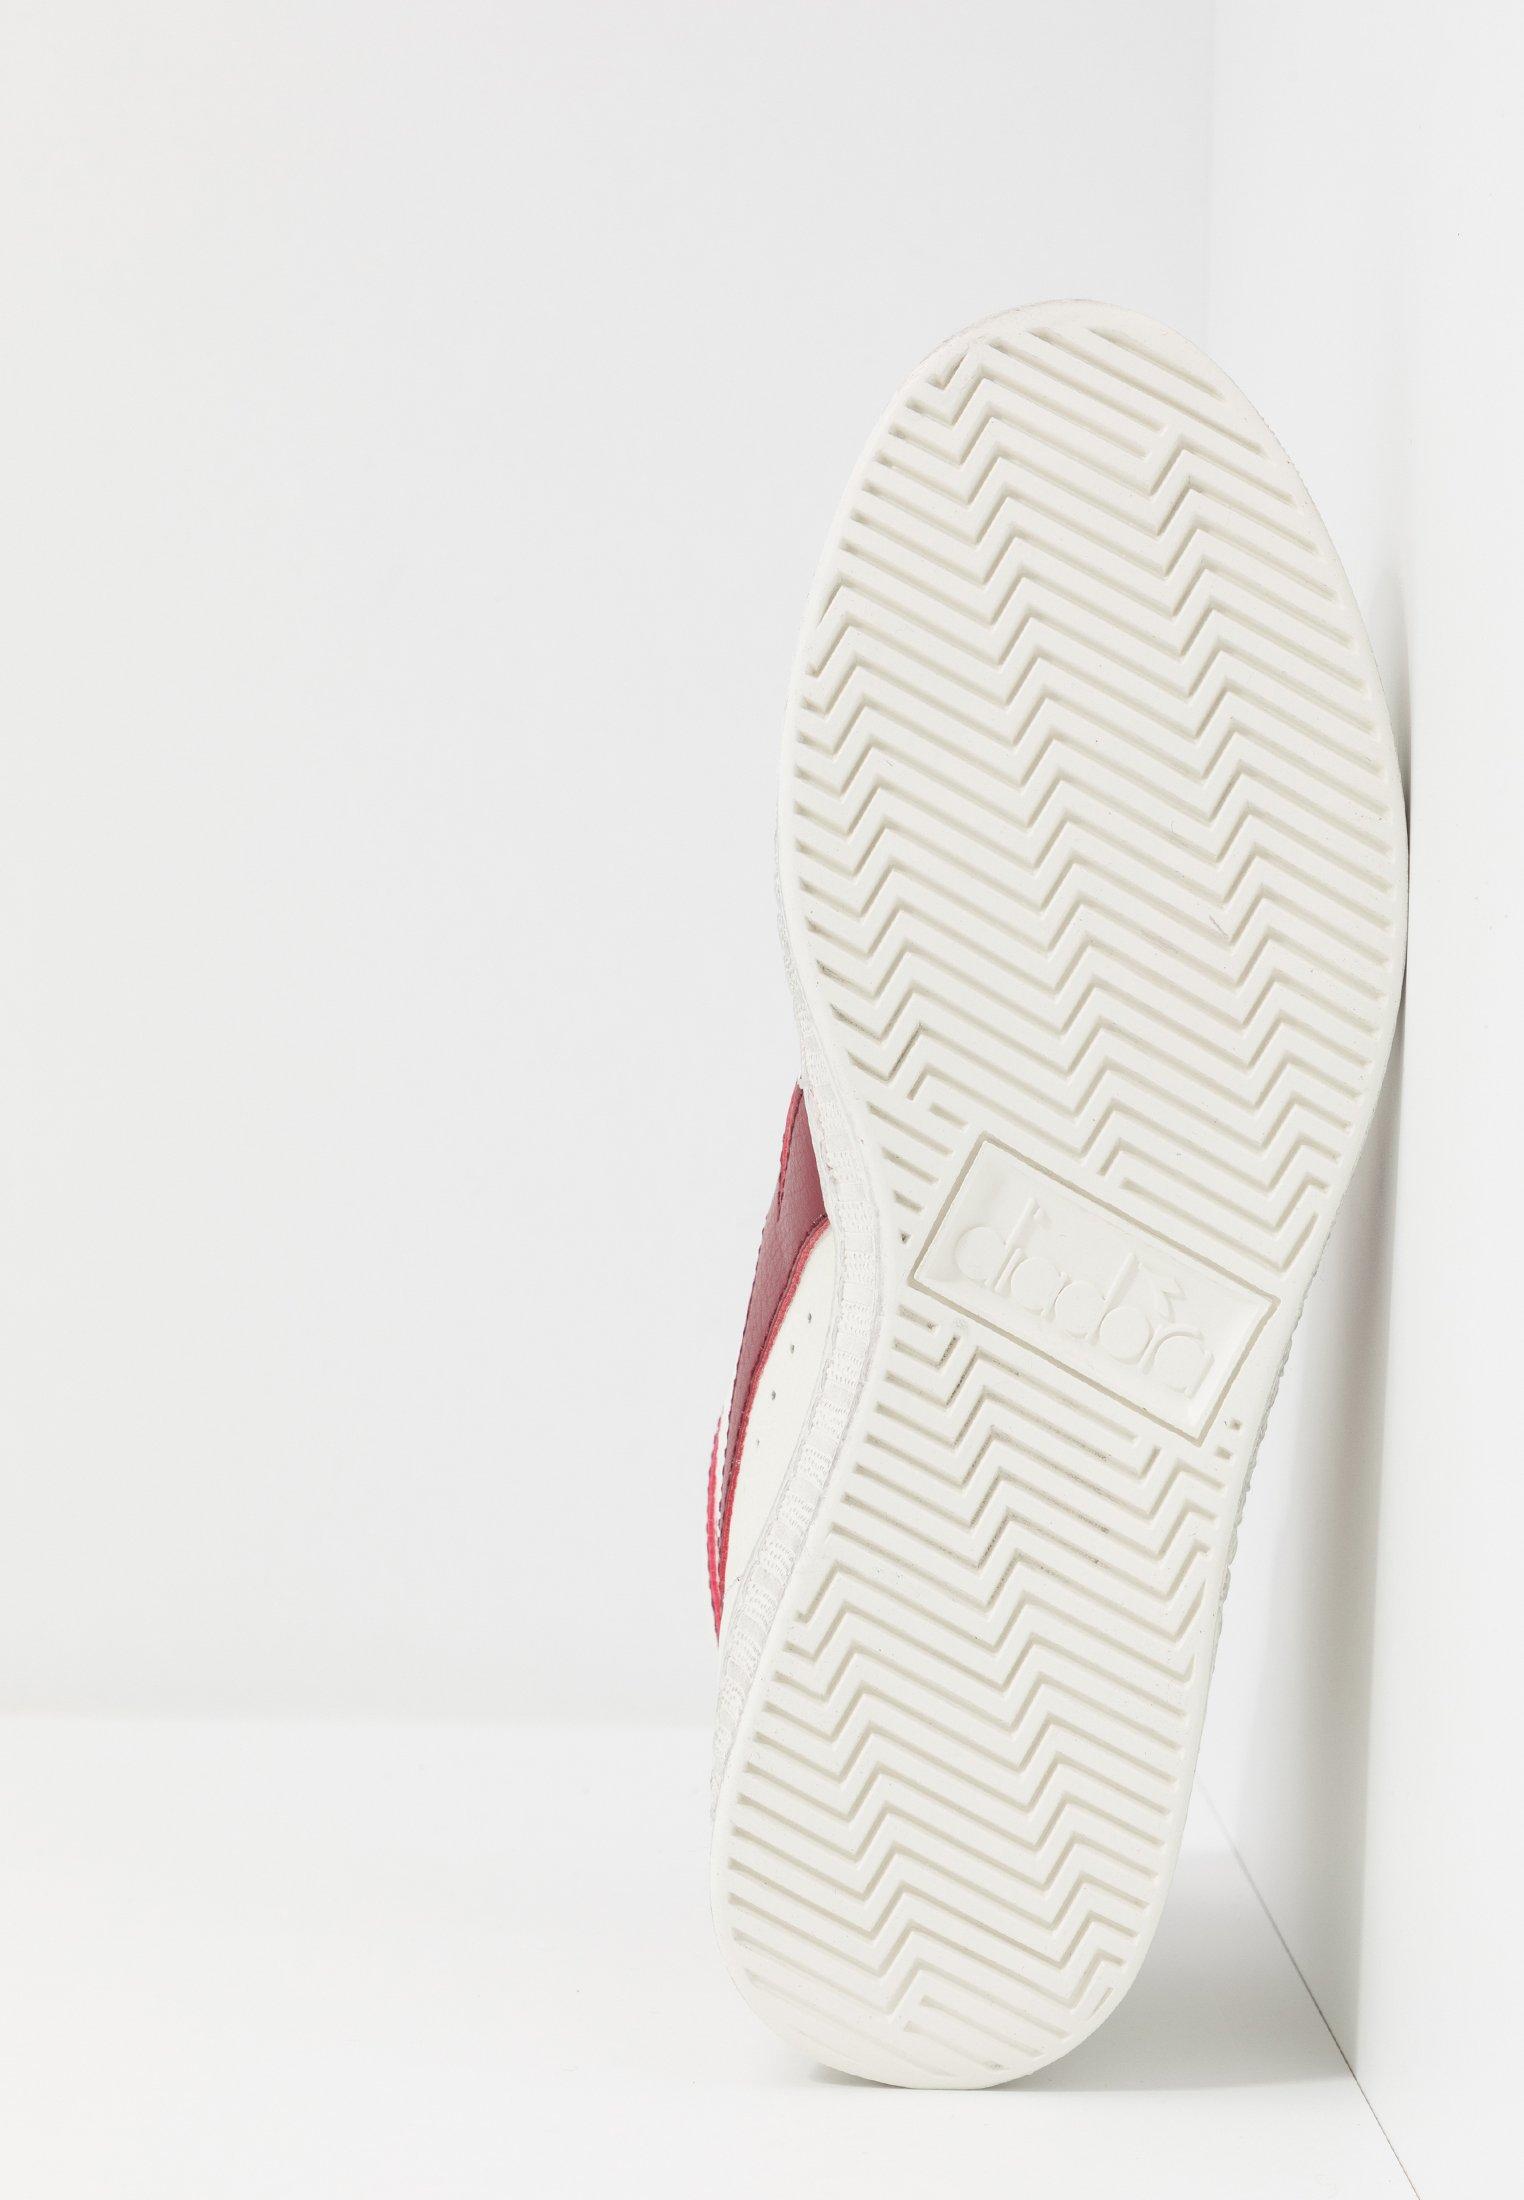 Diadora GAME WAXED - Sneakersy wysokie - white/red pepper